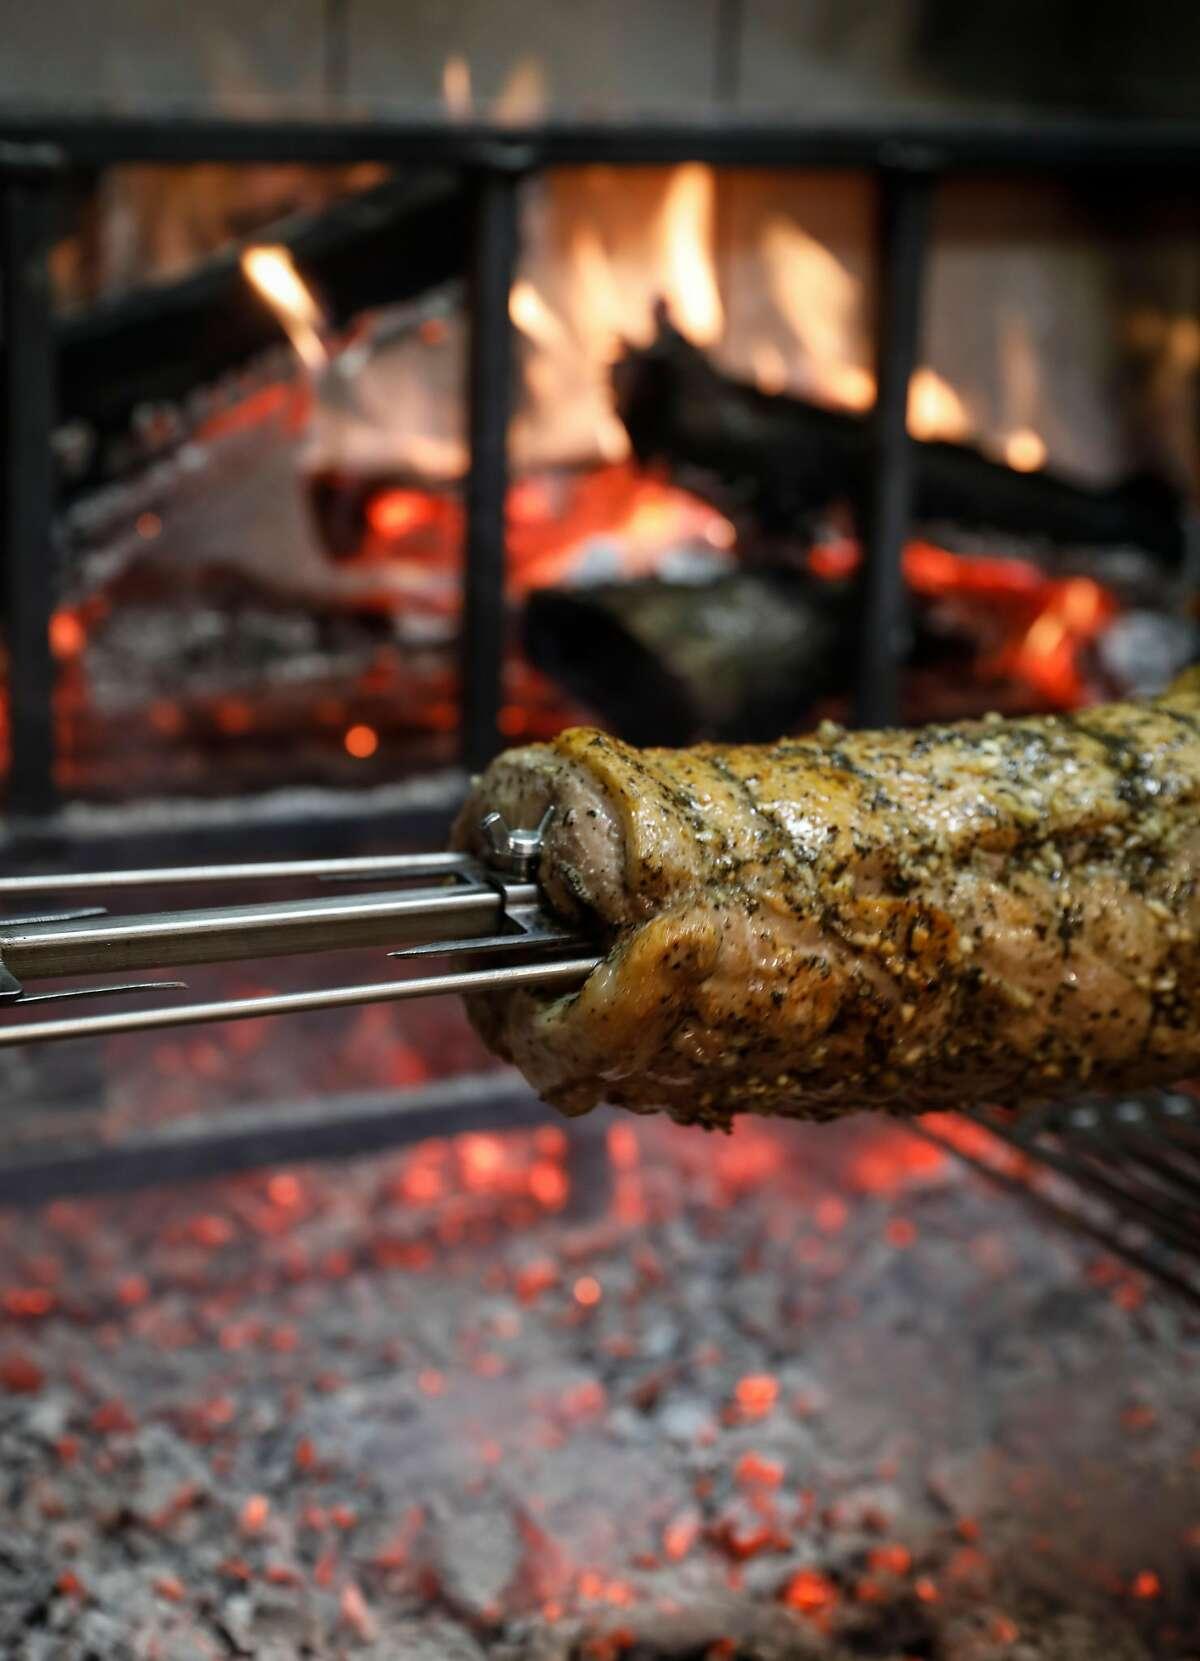 Pork roasts in an open oven at Meraki Market on Thursday, Oct. 19, 2017 in San Francisco, Calif.